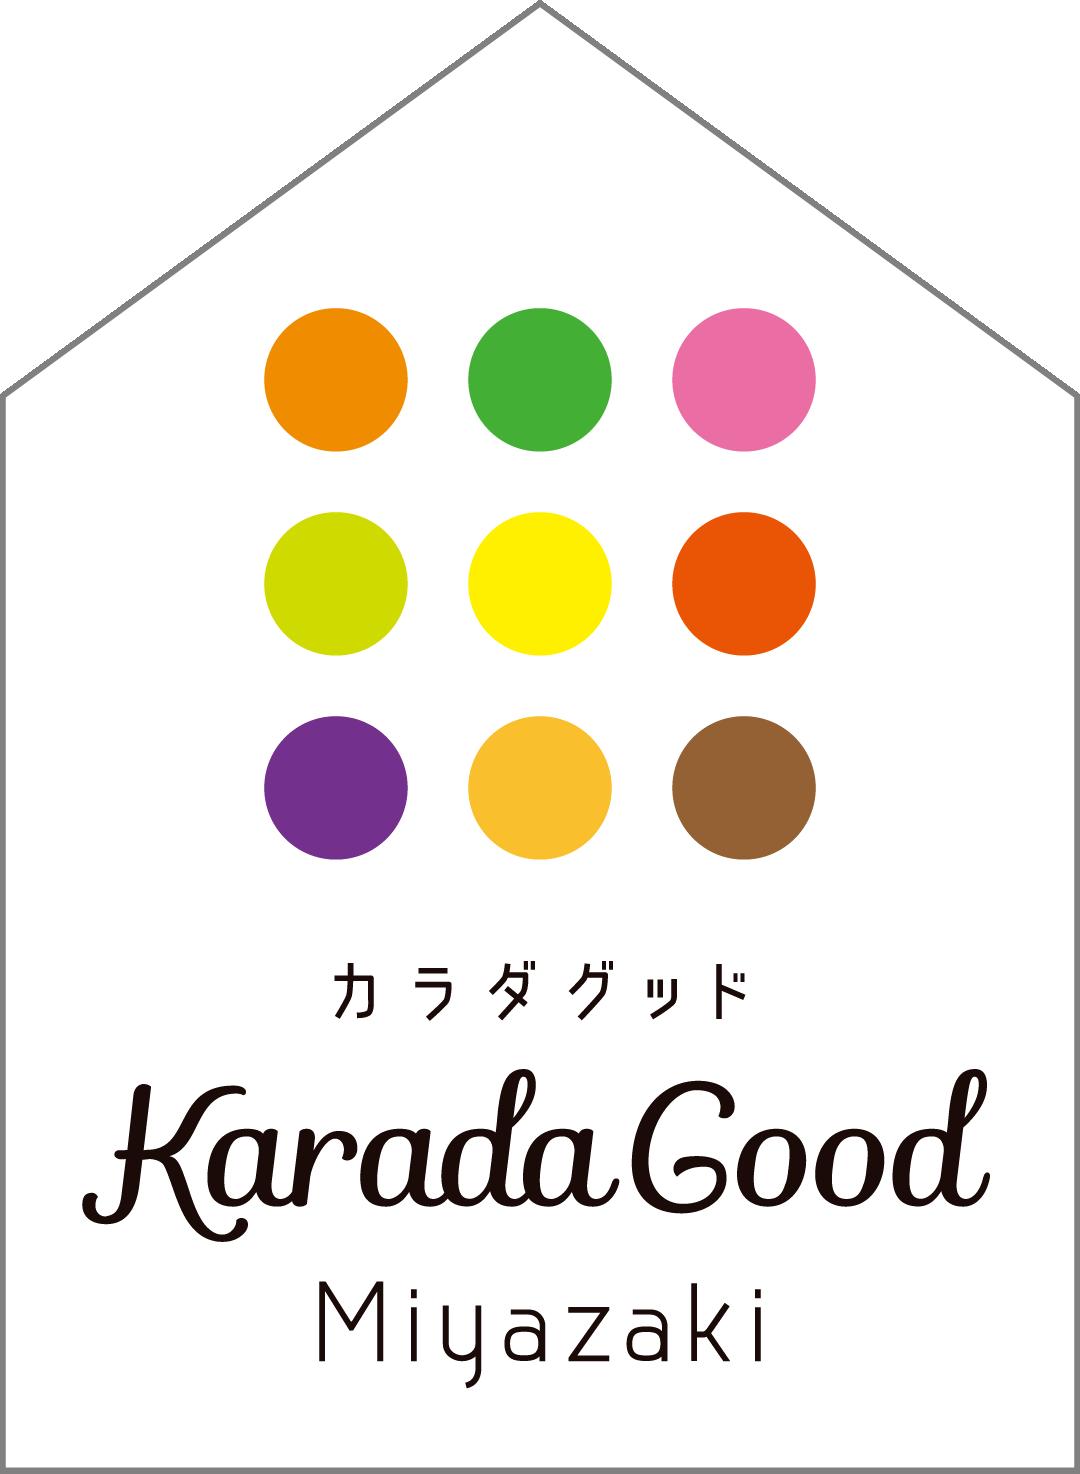 Karada Good Miyazakiのサムネイル画像